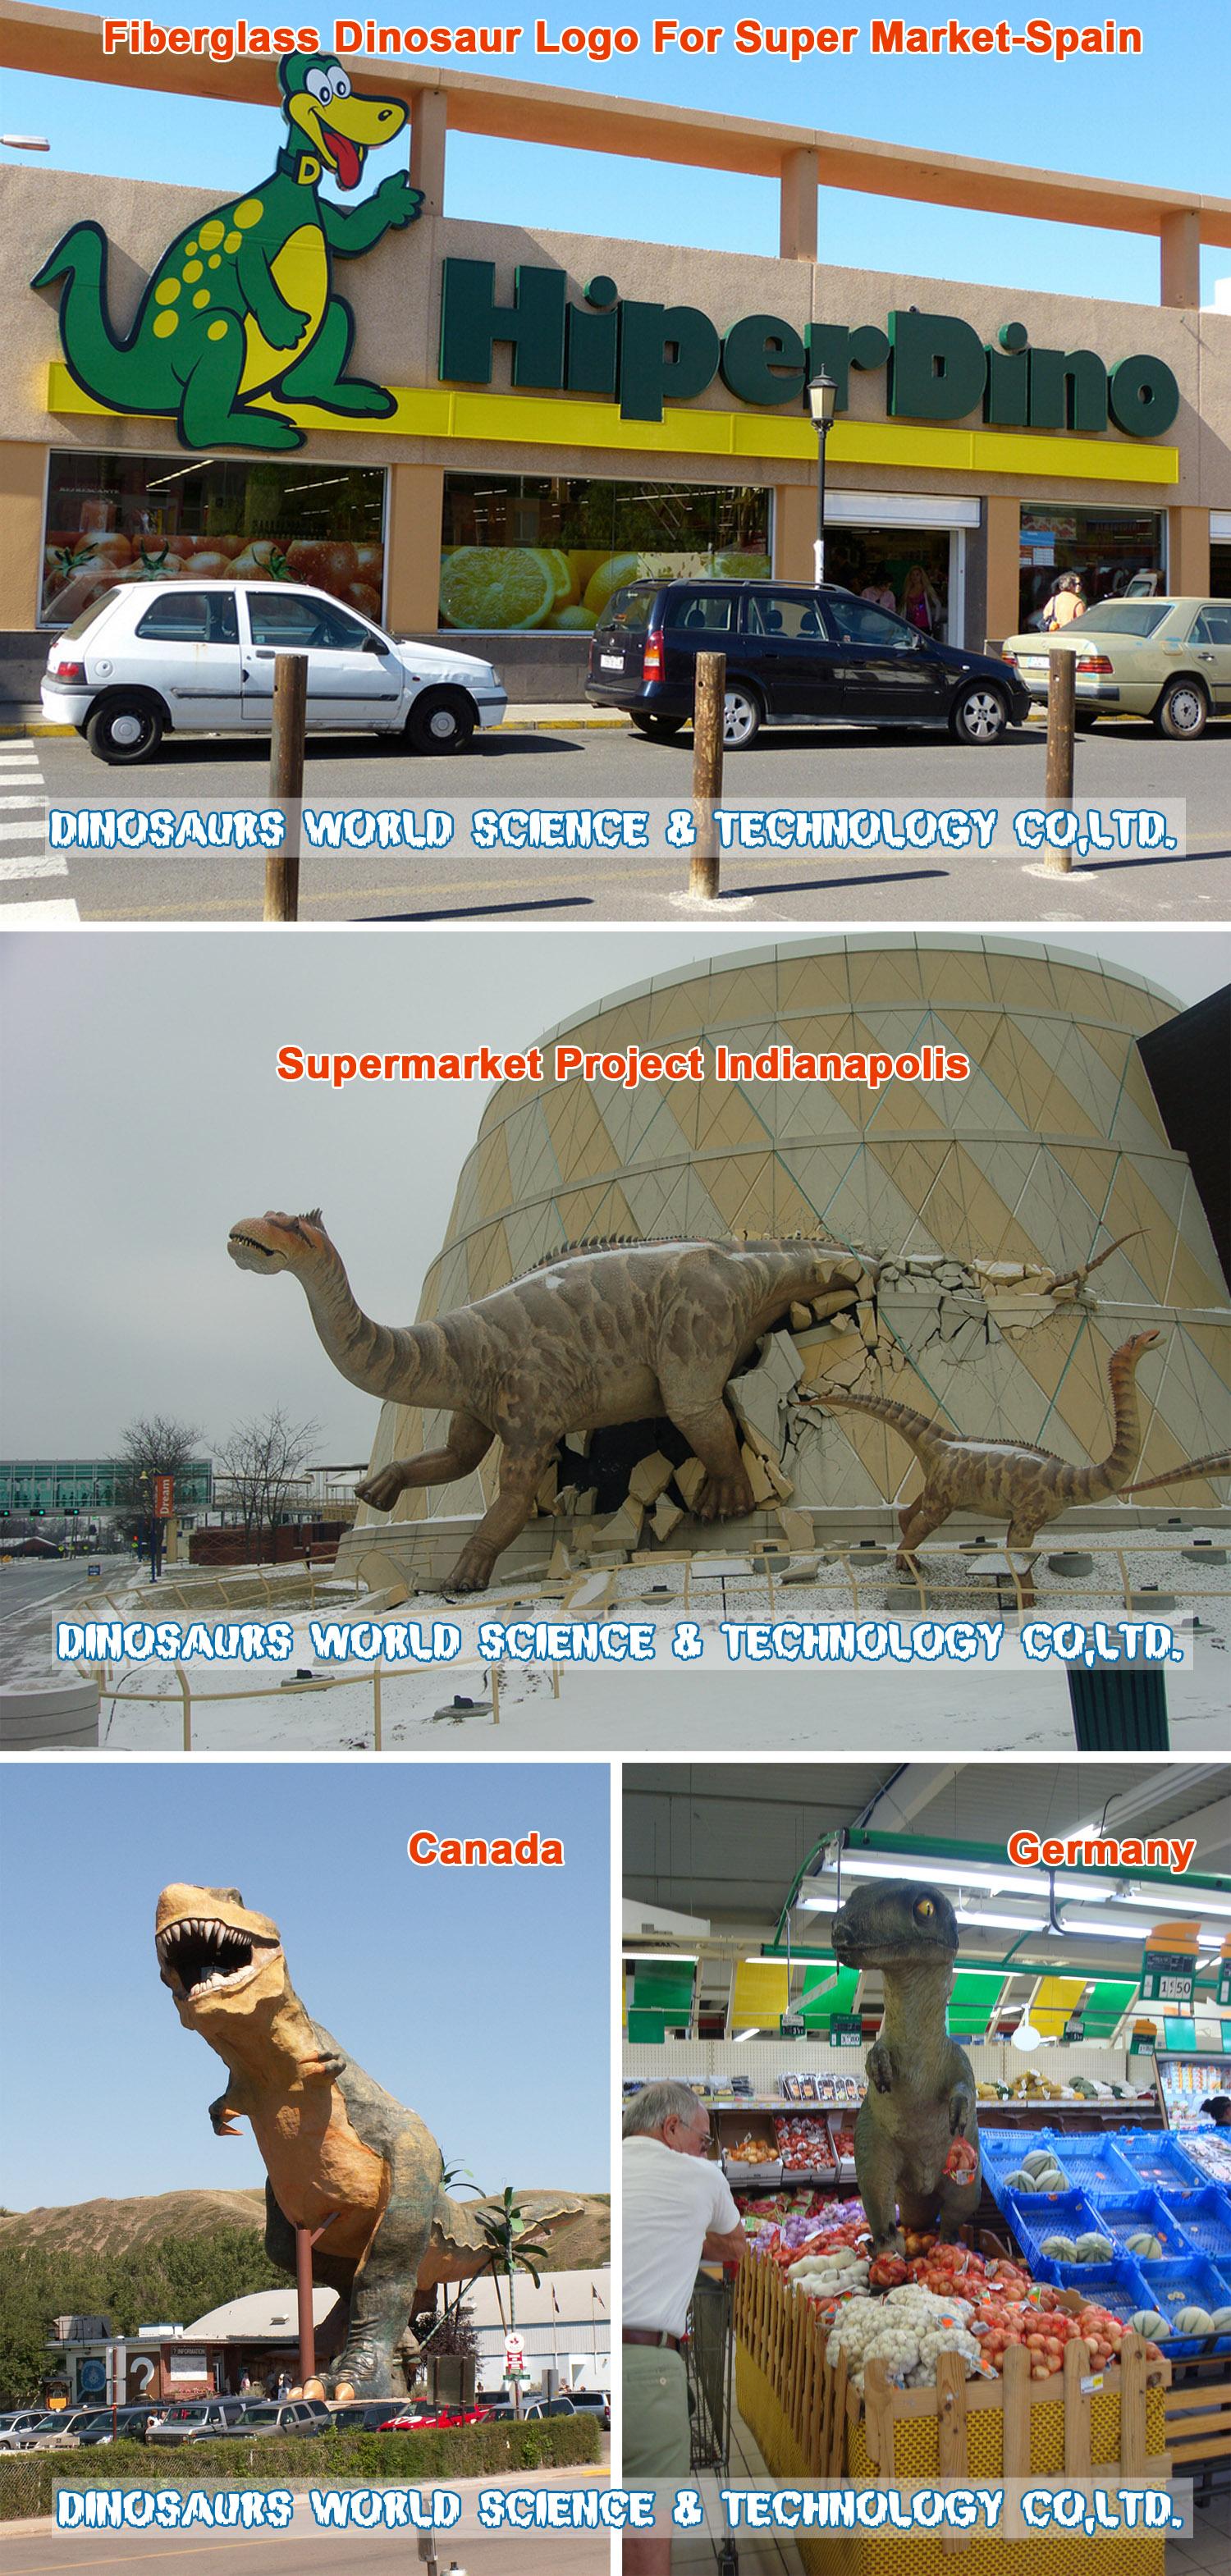 fiberglass dinosaurs,fiberglass T-rex,dinosaurs supermarket project